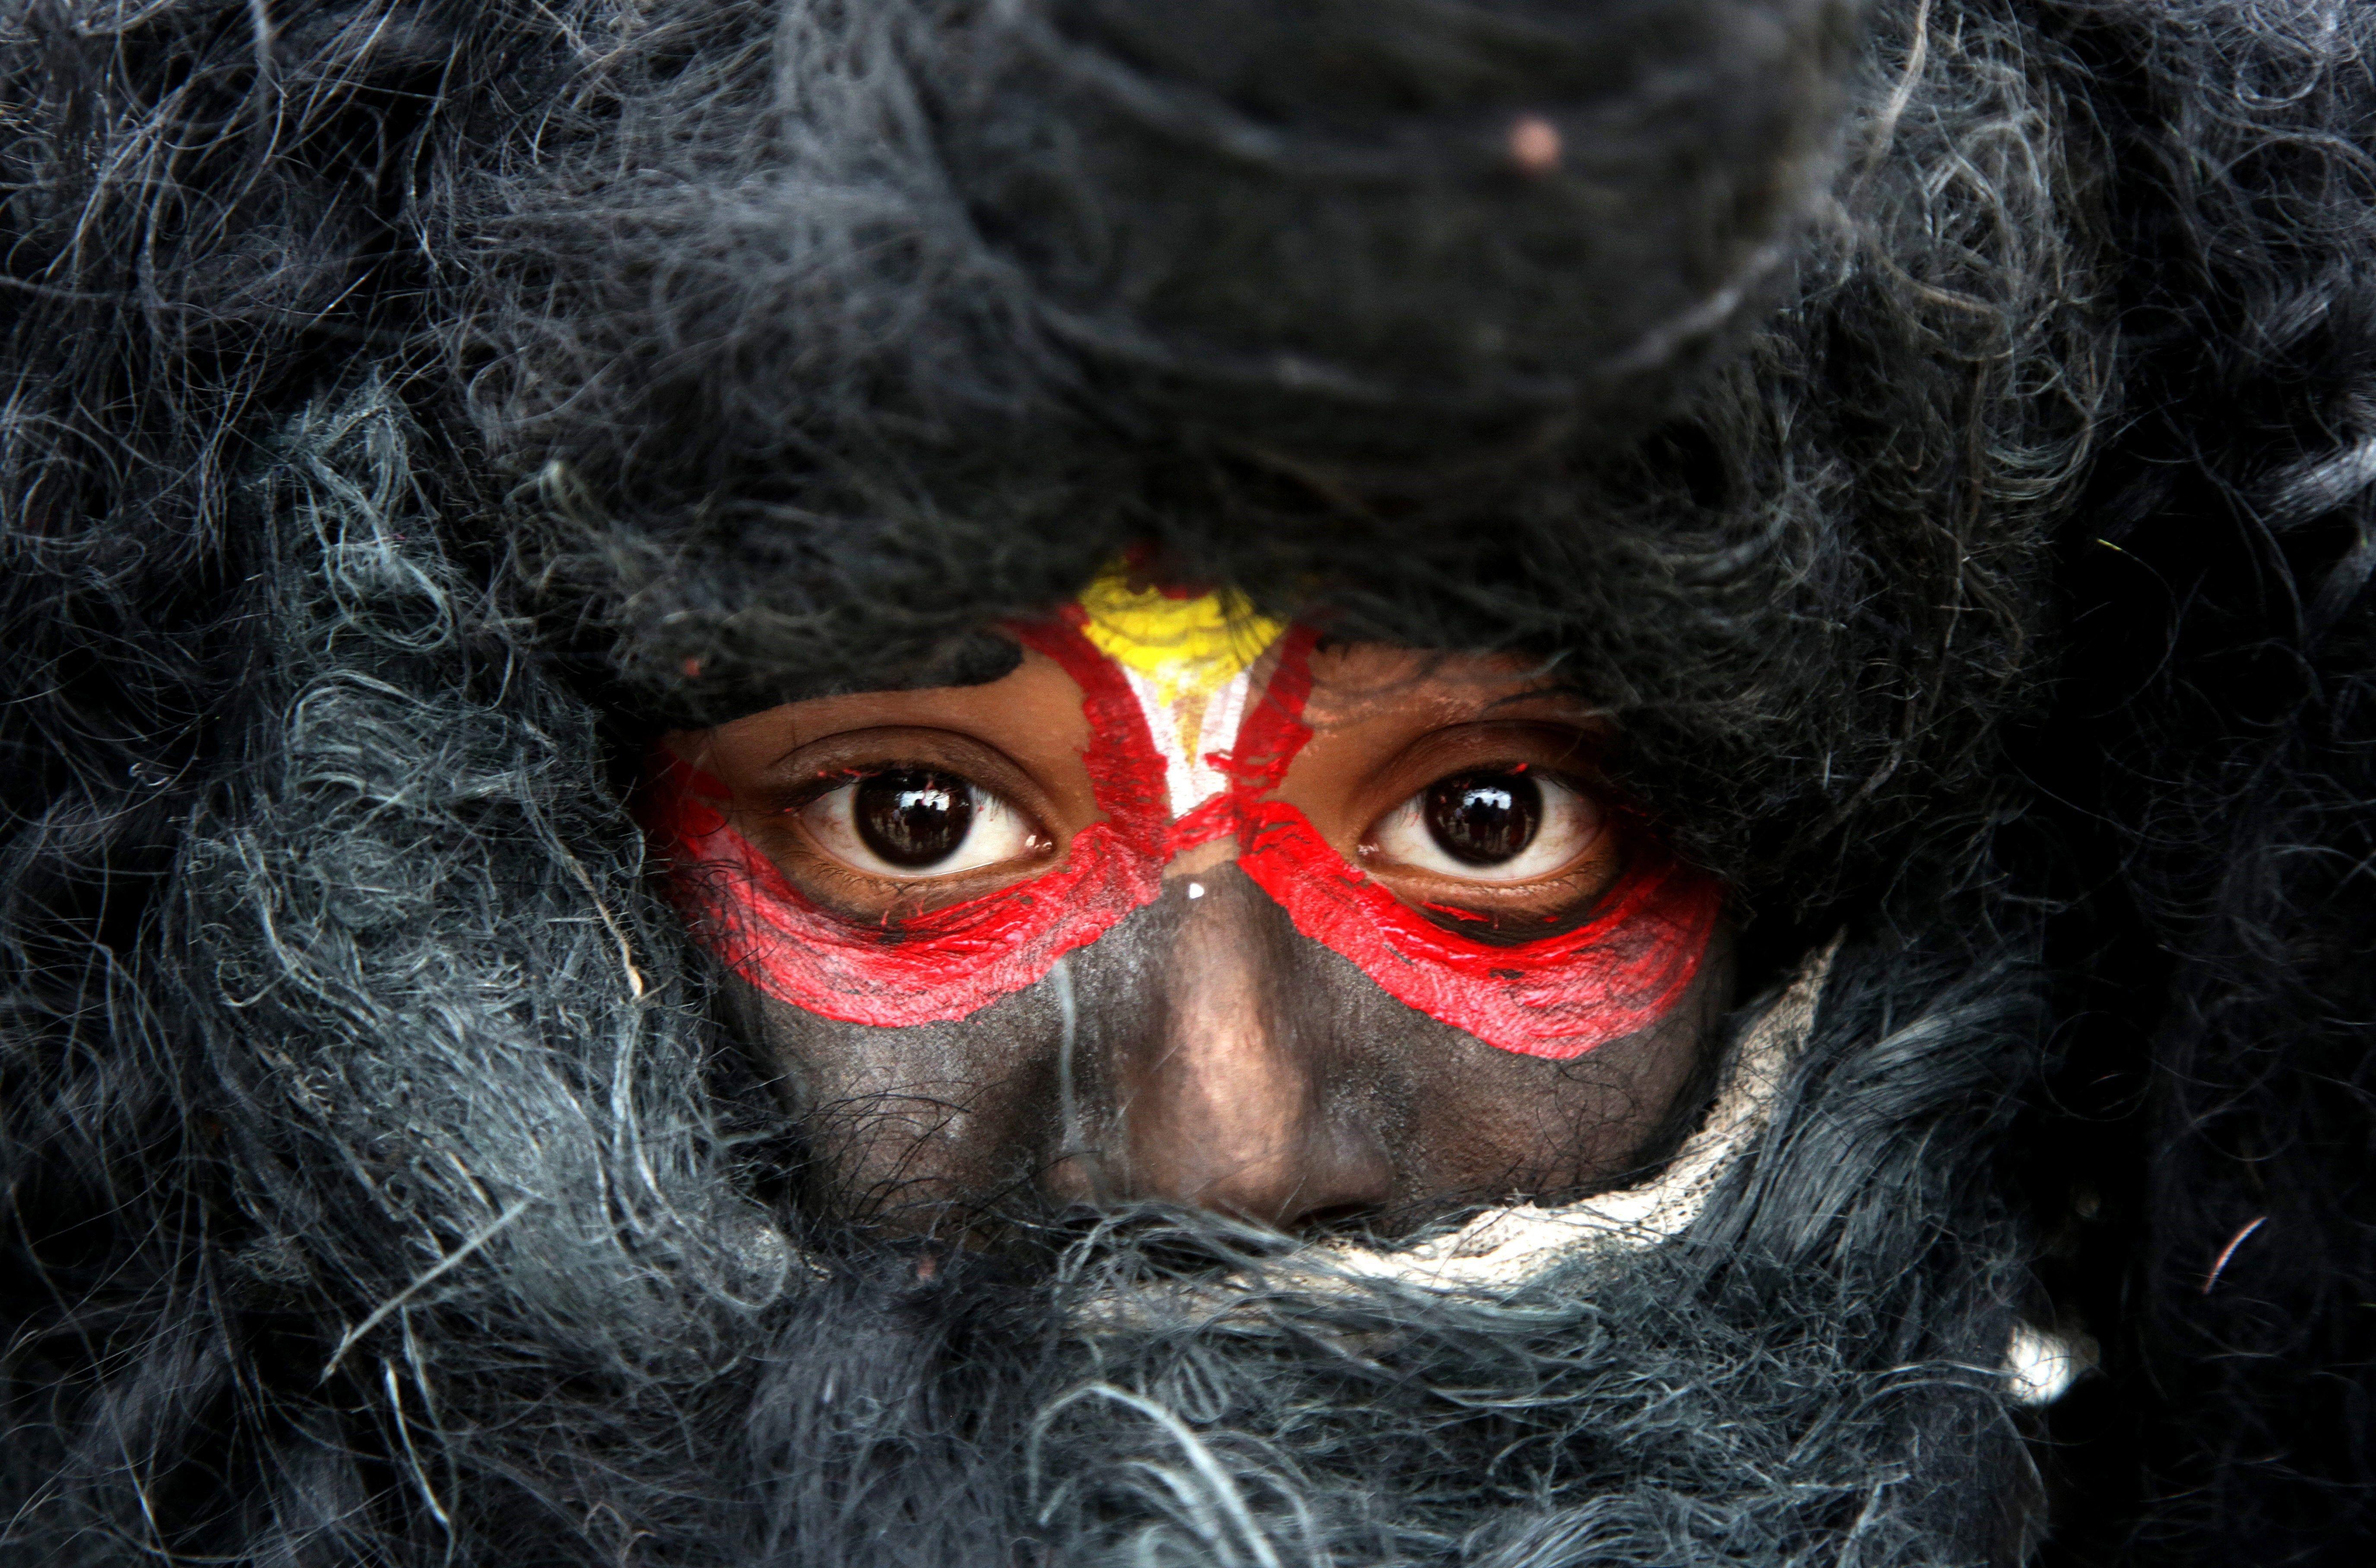 "Un nin indi, vestit com el déu Shiva, participa a la festivitat popular hindú ""Maha Shivaratri"". /JAIPAL SINGH"